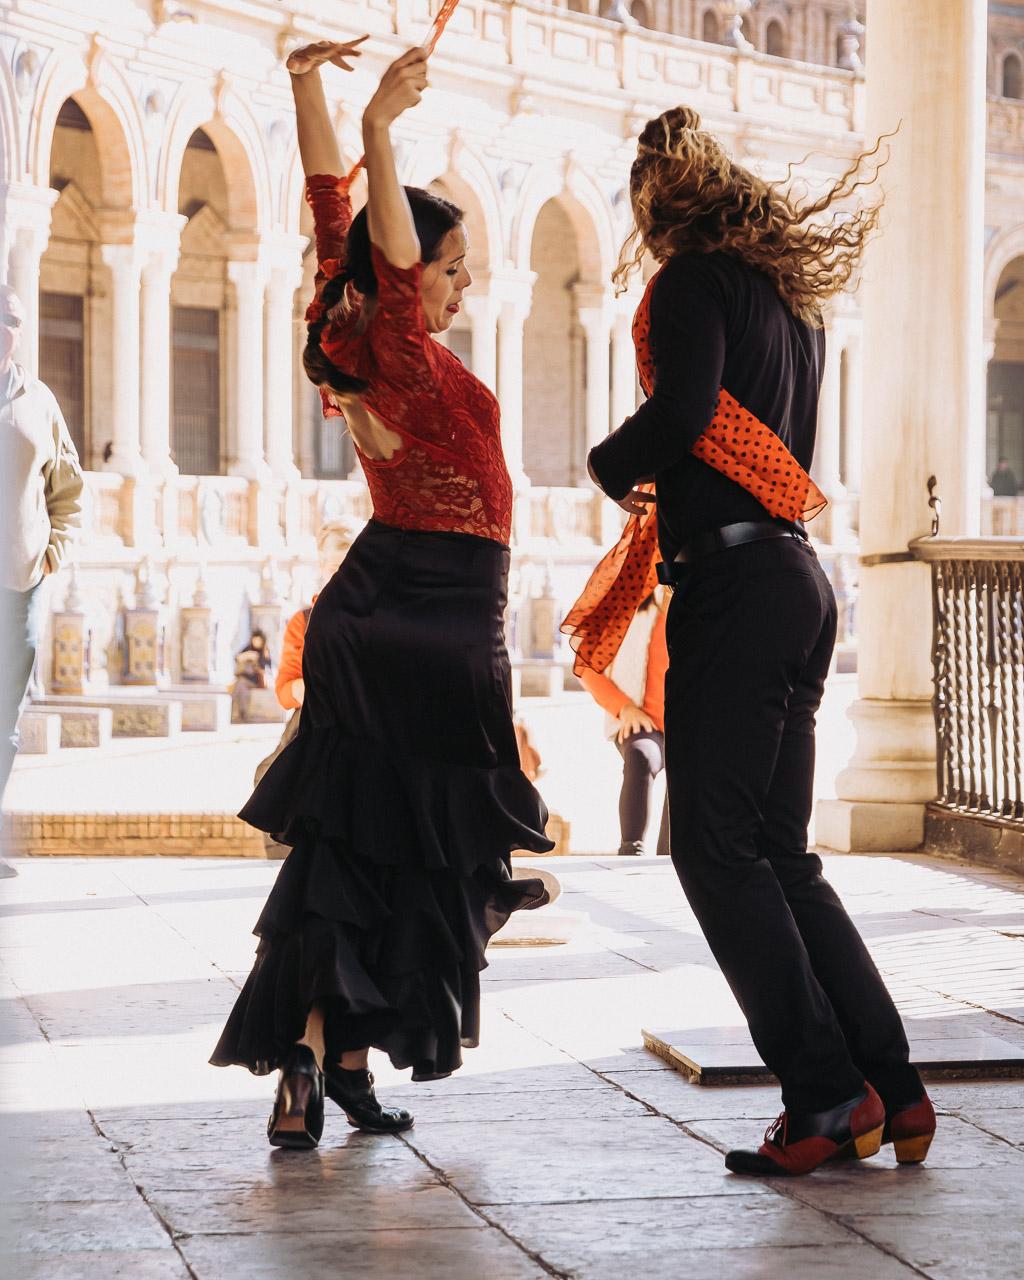 reseblogg, flamenco